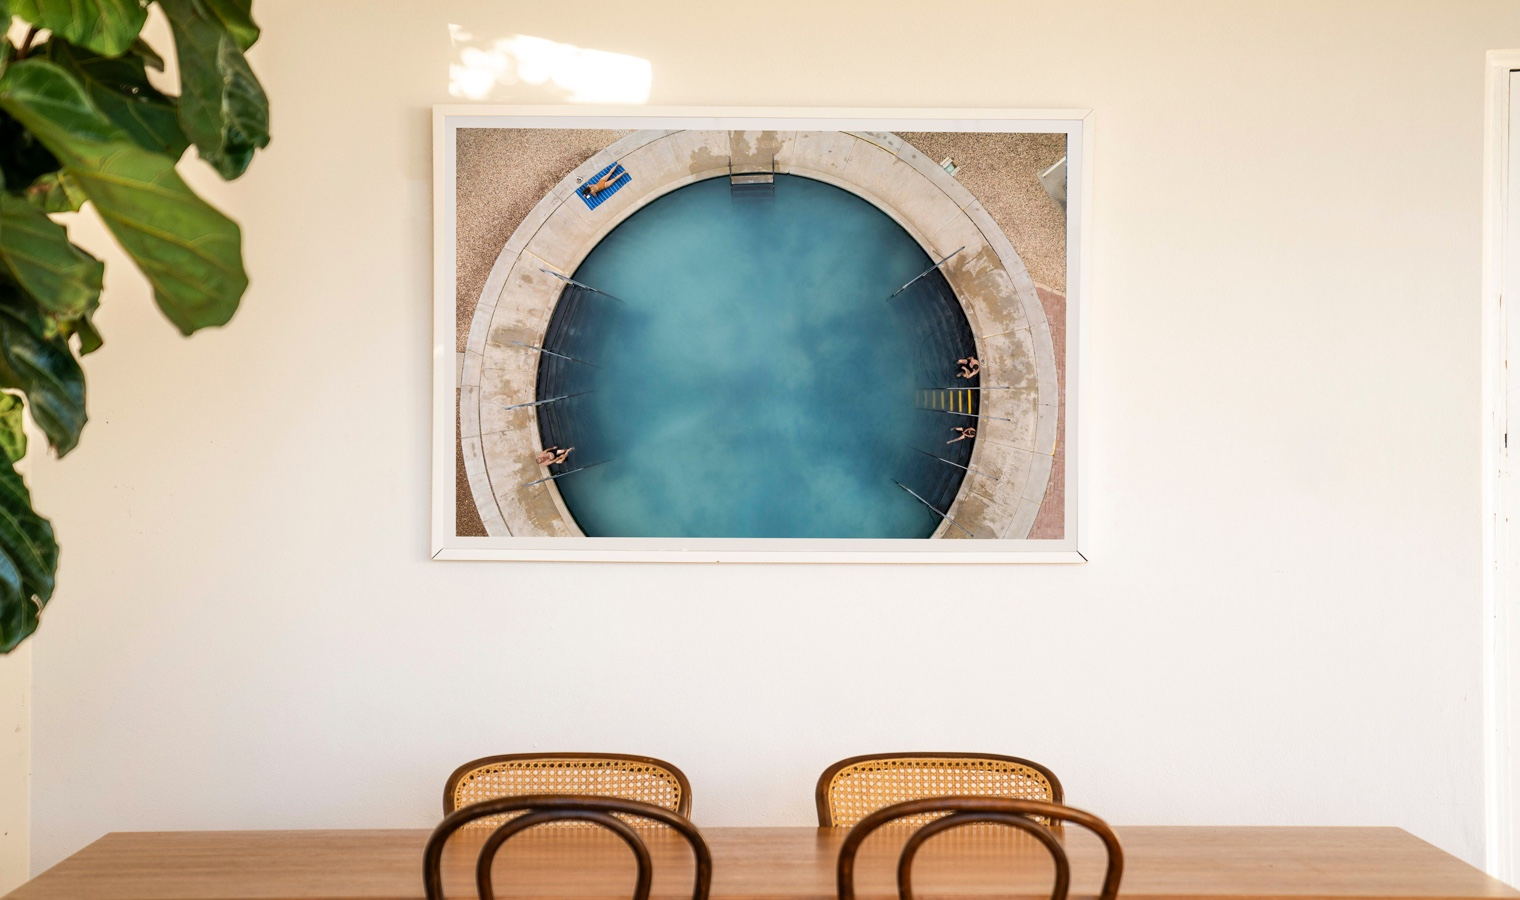 places-we-swim-prints-ethical-design-agency-sustainable-brands-graphic-designer-sydney-byron-bay-bondi-melbourne-branding-bronte.jpg